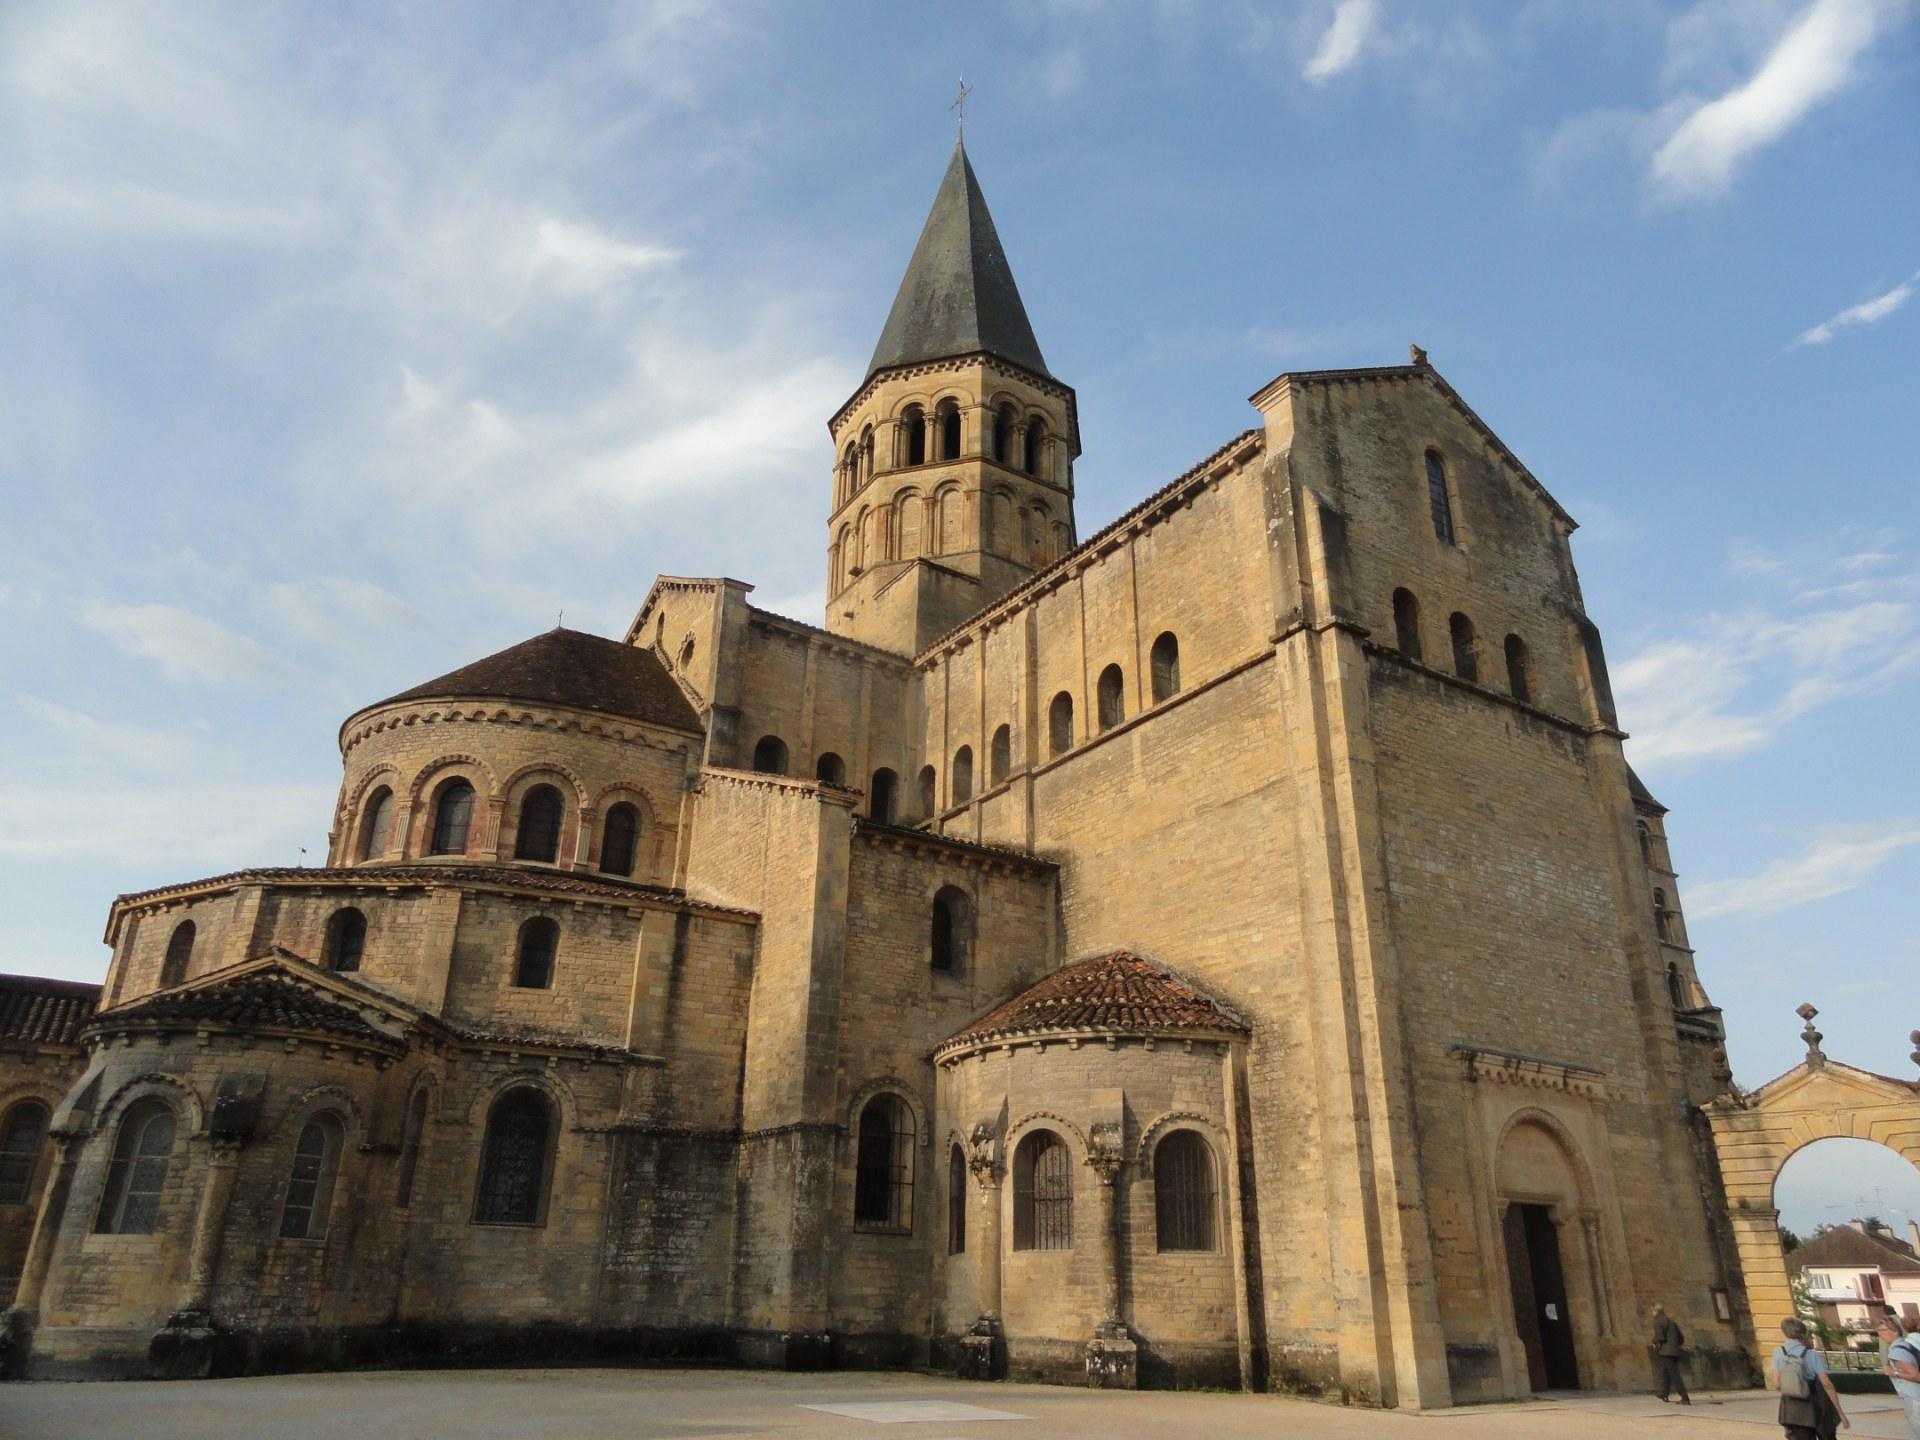 2017-06-16 - Pe#lerinage en Bourgogne - 086